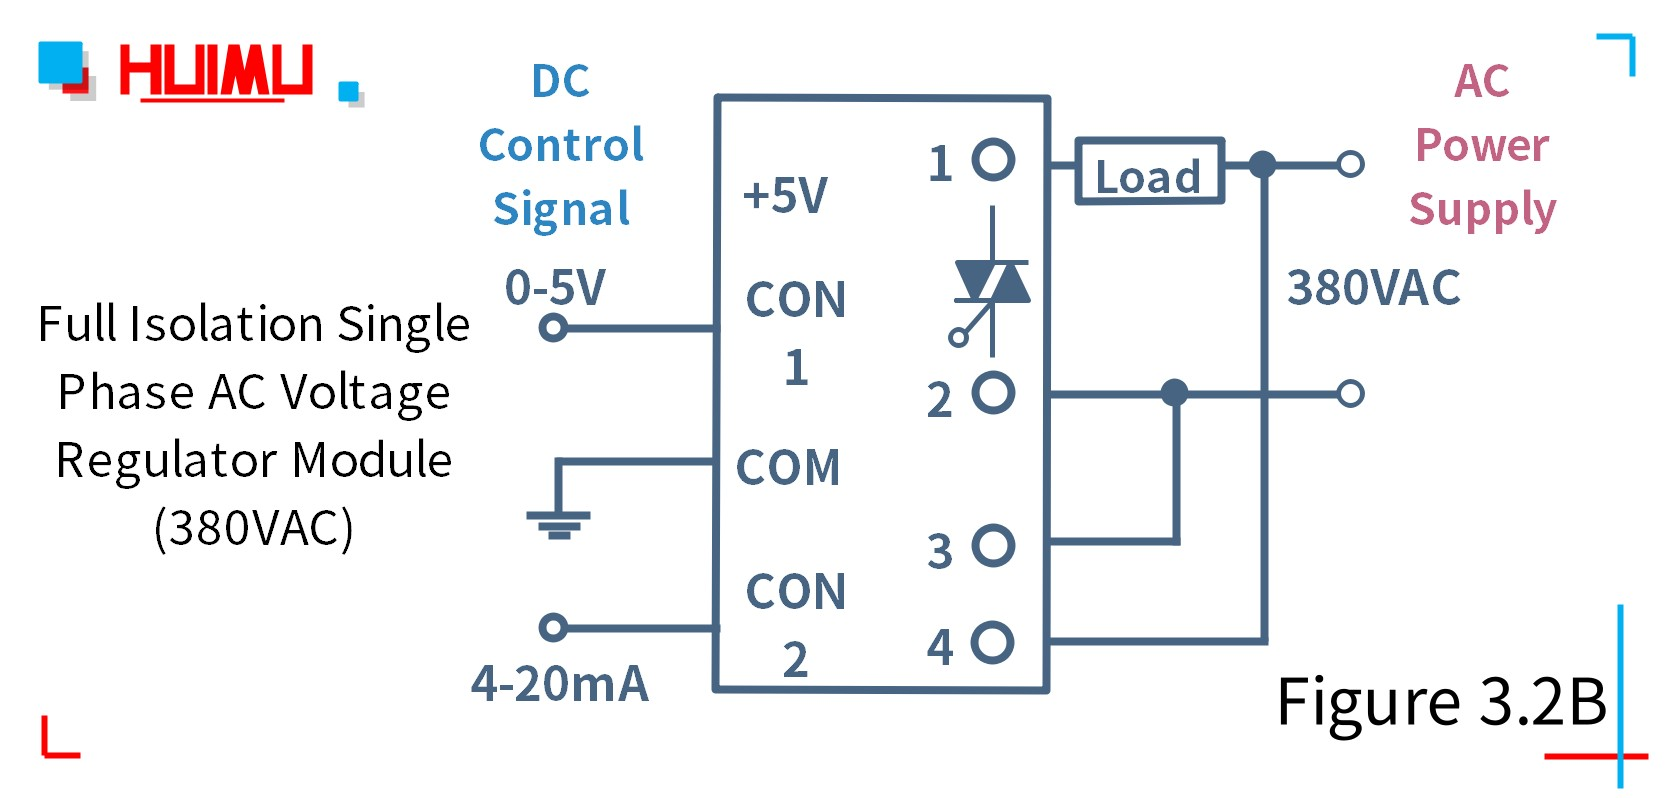 How to wire MGR voltage regulator/voltage regulation module? |HUIMULTD